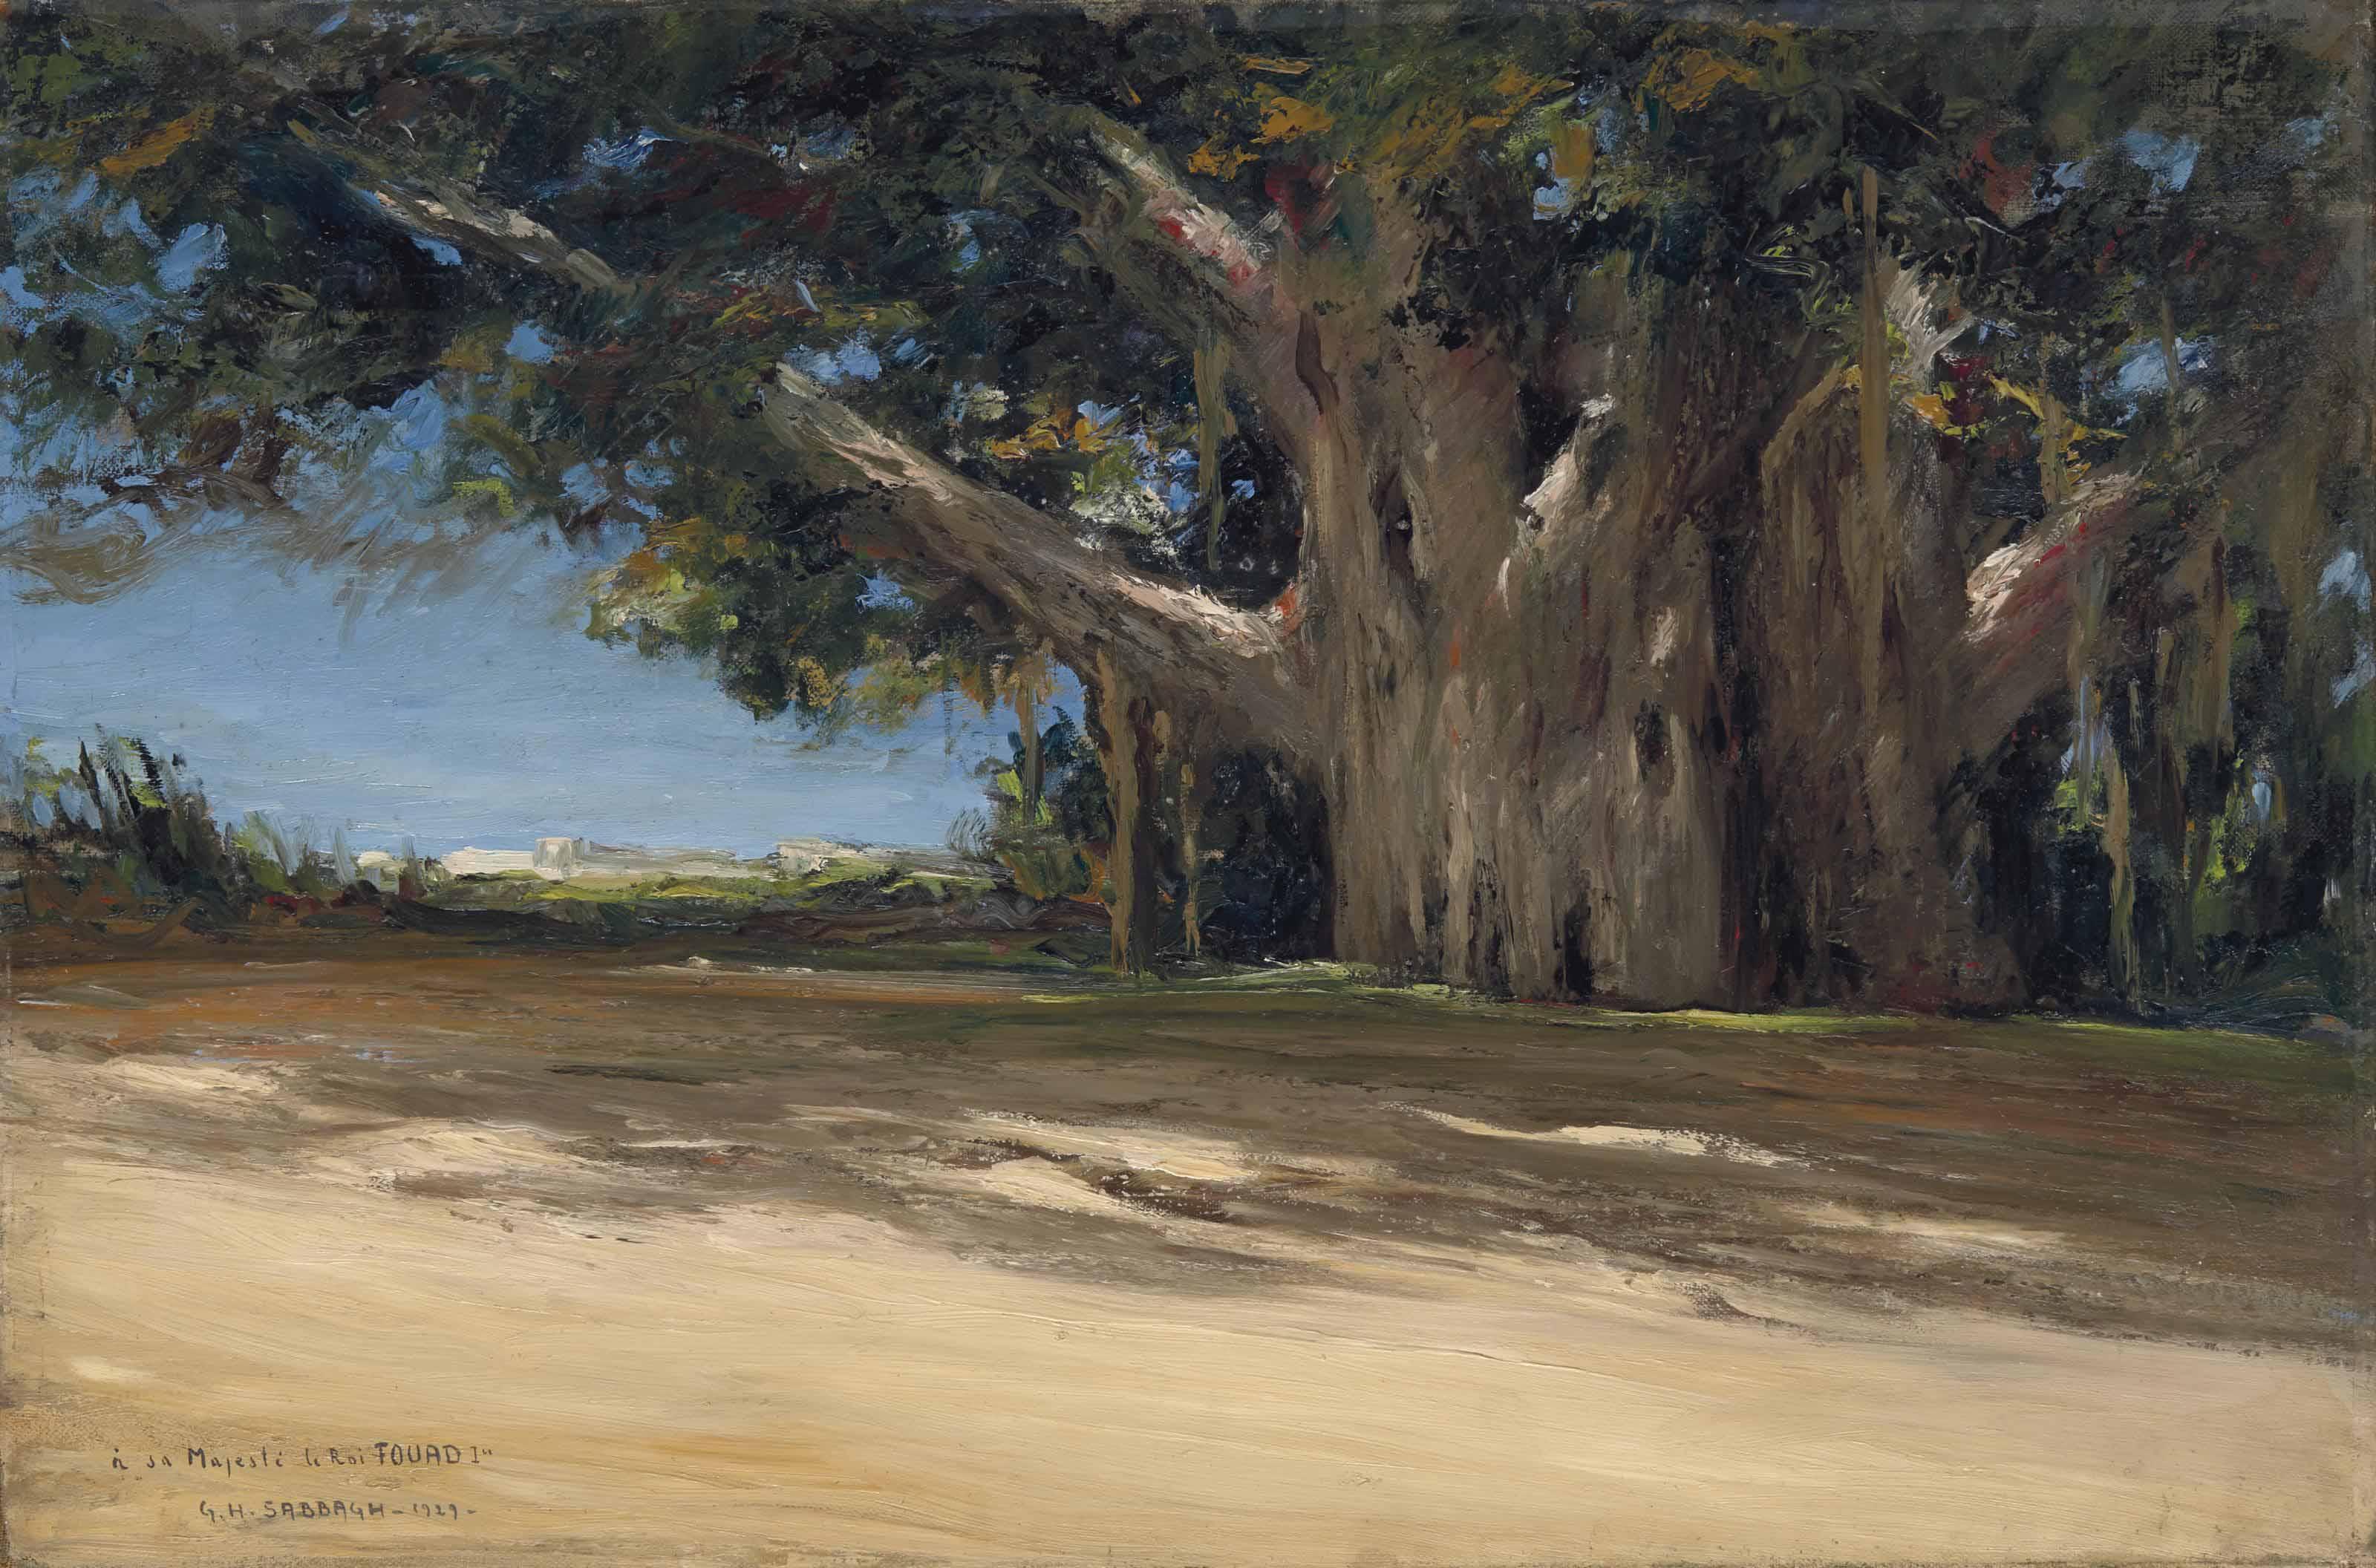 Les Sycomores du Vieux Caire (Old Cairo's Sycamore Trees)